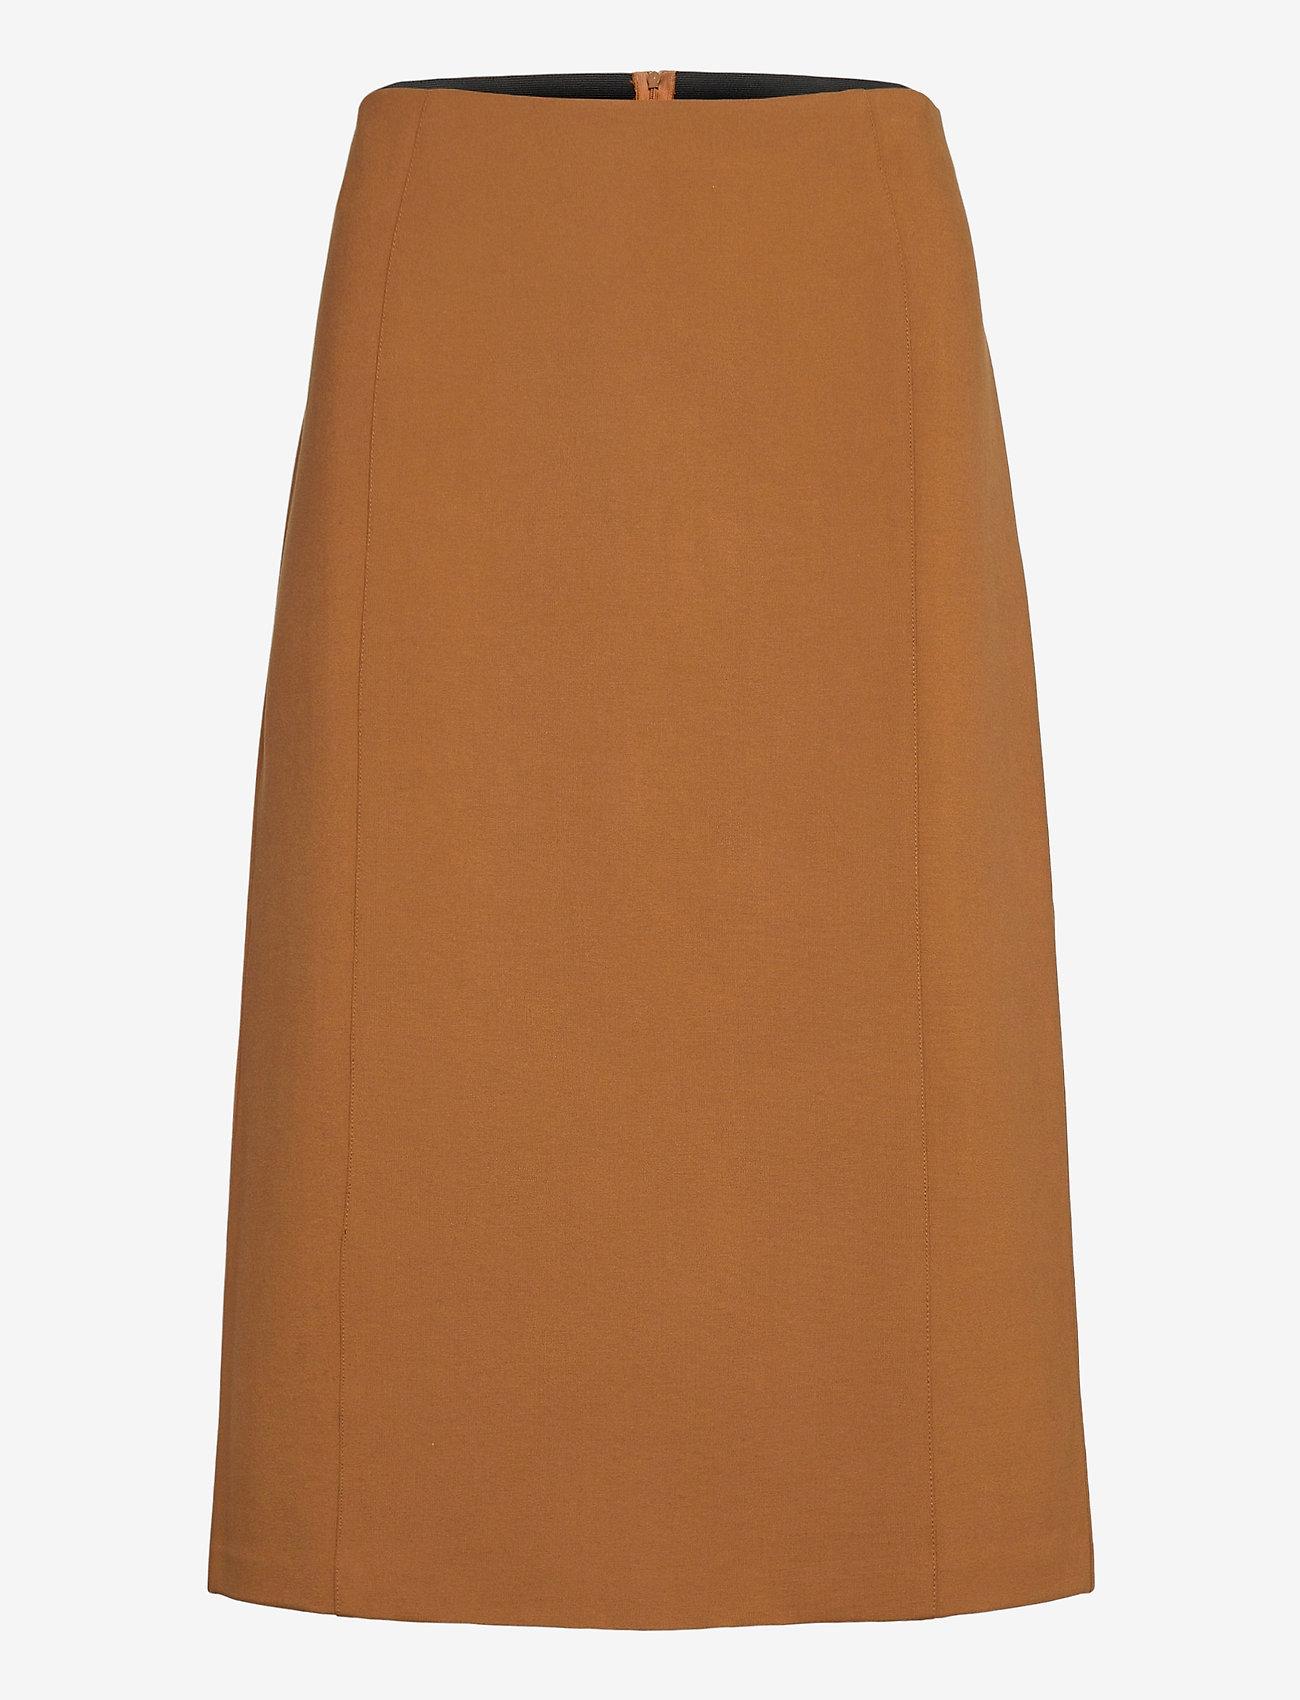 SAND - 2548 - Malhia Skirt - midi kjolar - light camel - 0